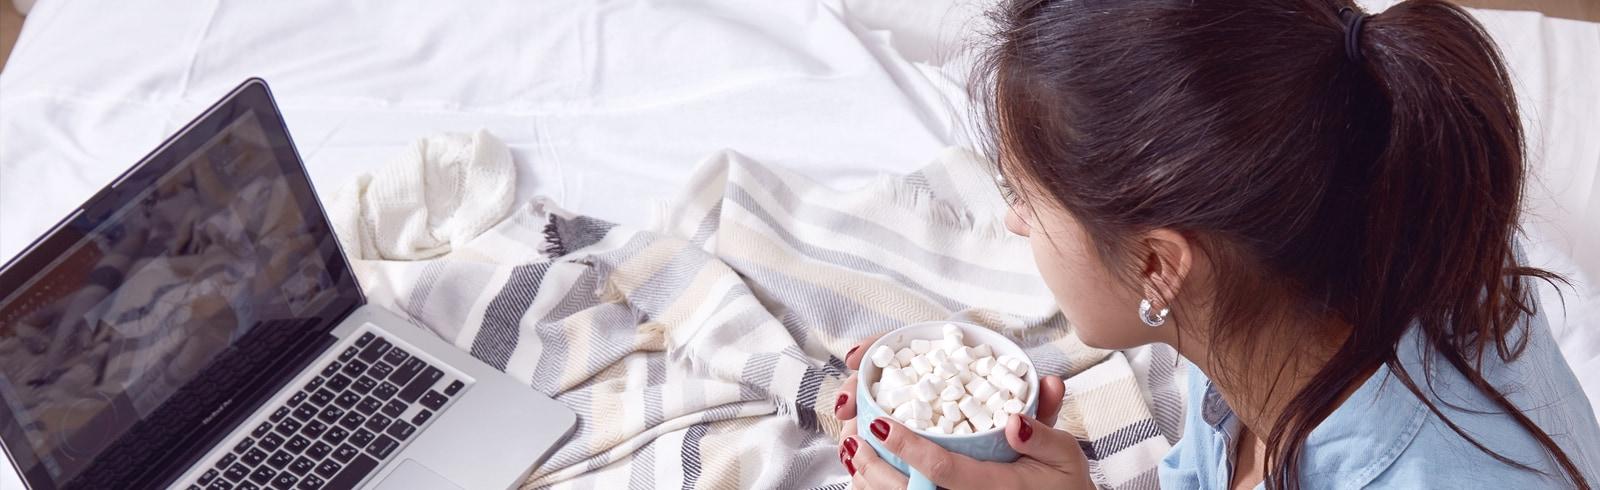 Marshmallow teachs about savings